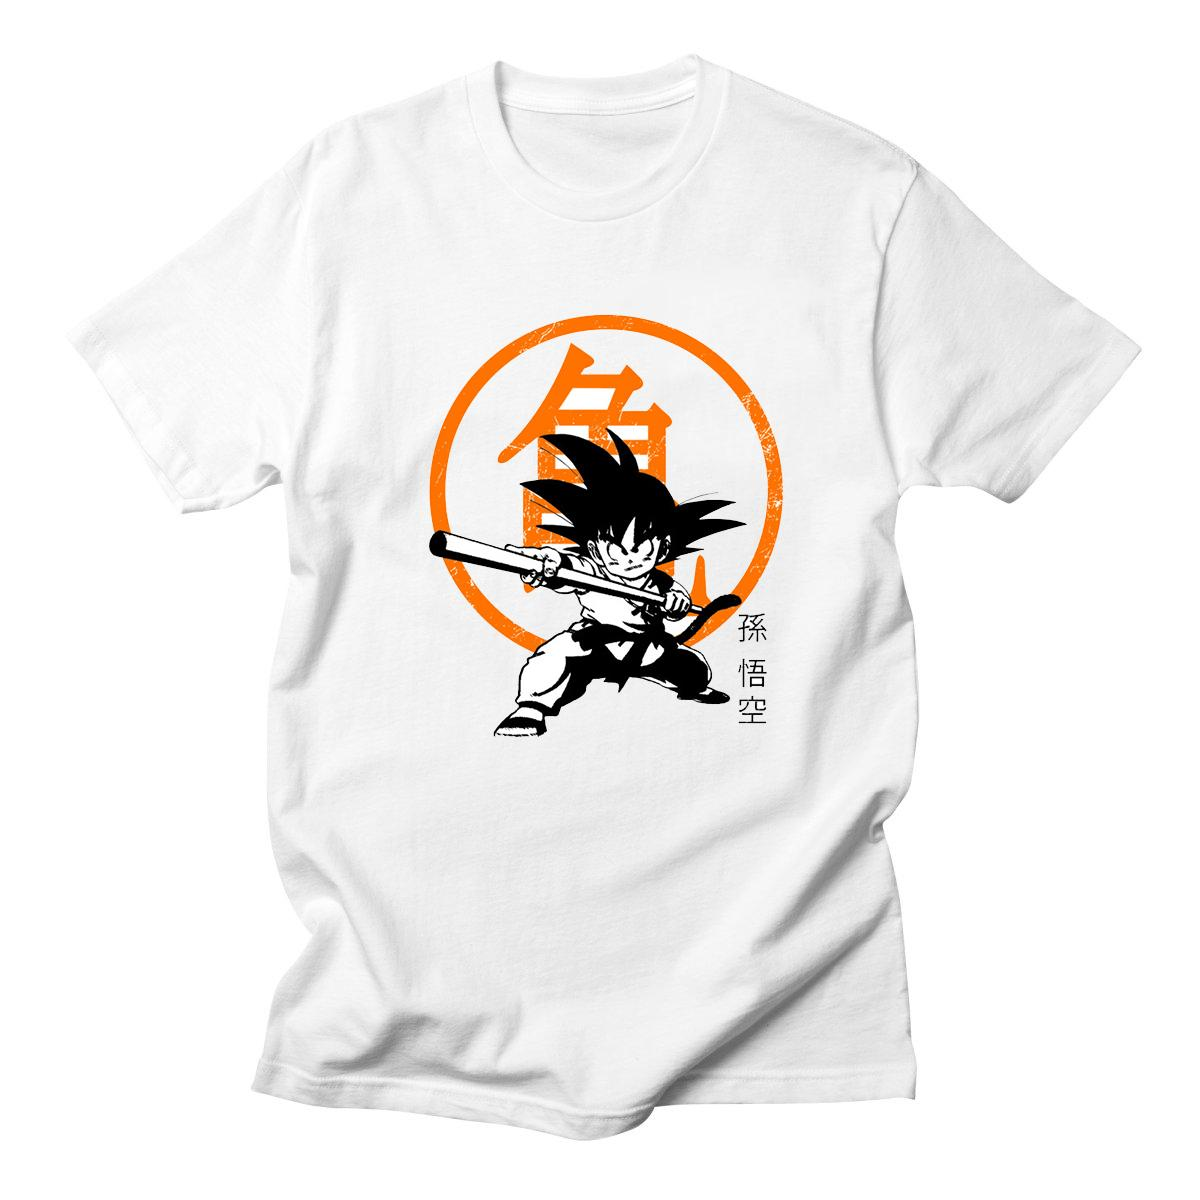 Yeni Dragon Ball Tişörtlü Super Saiyan Dragonball Z Dbz Son Goku Tişört Japonya Soğuk Vegeta Anime Tişört Erkek / Boy Tee Tops